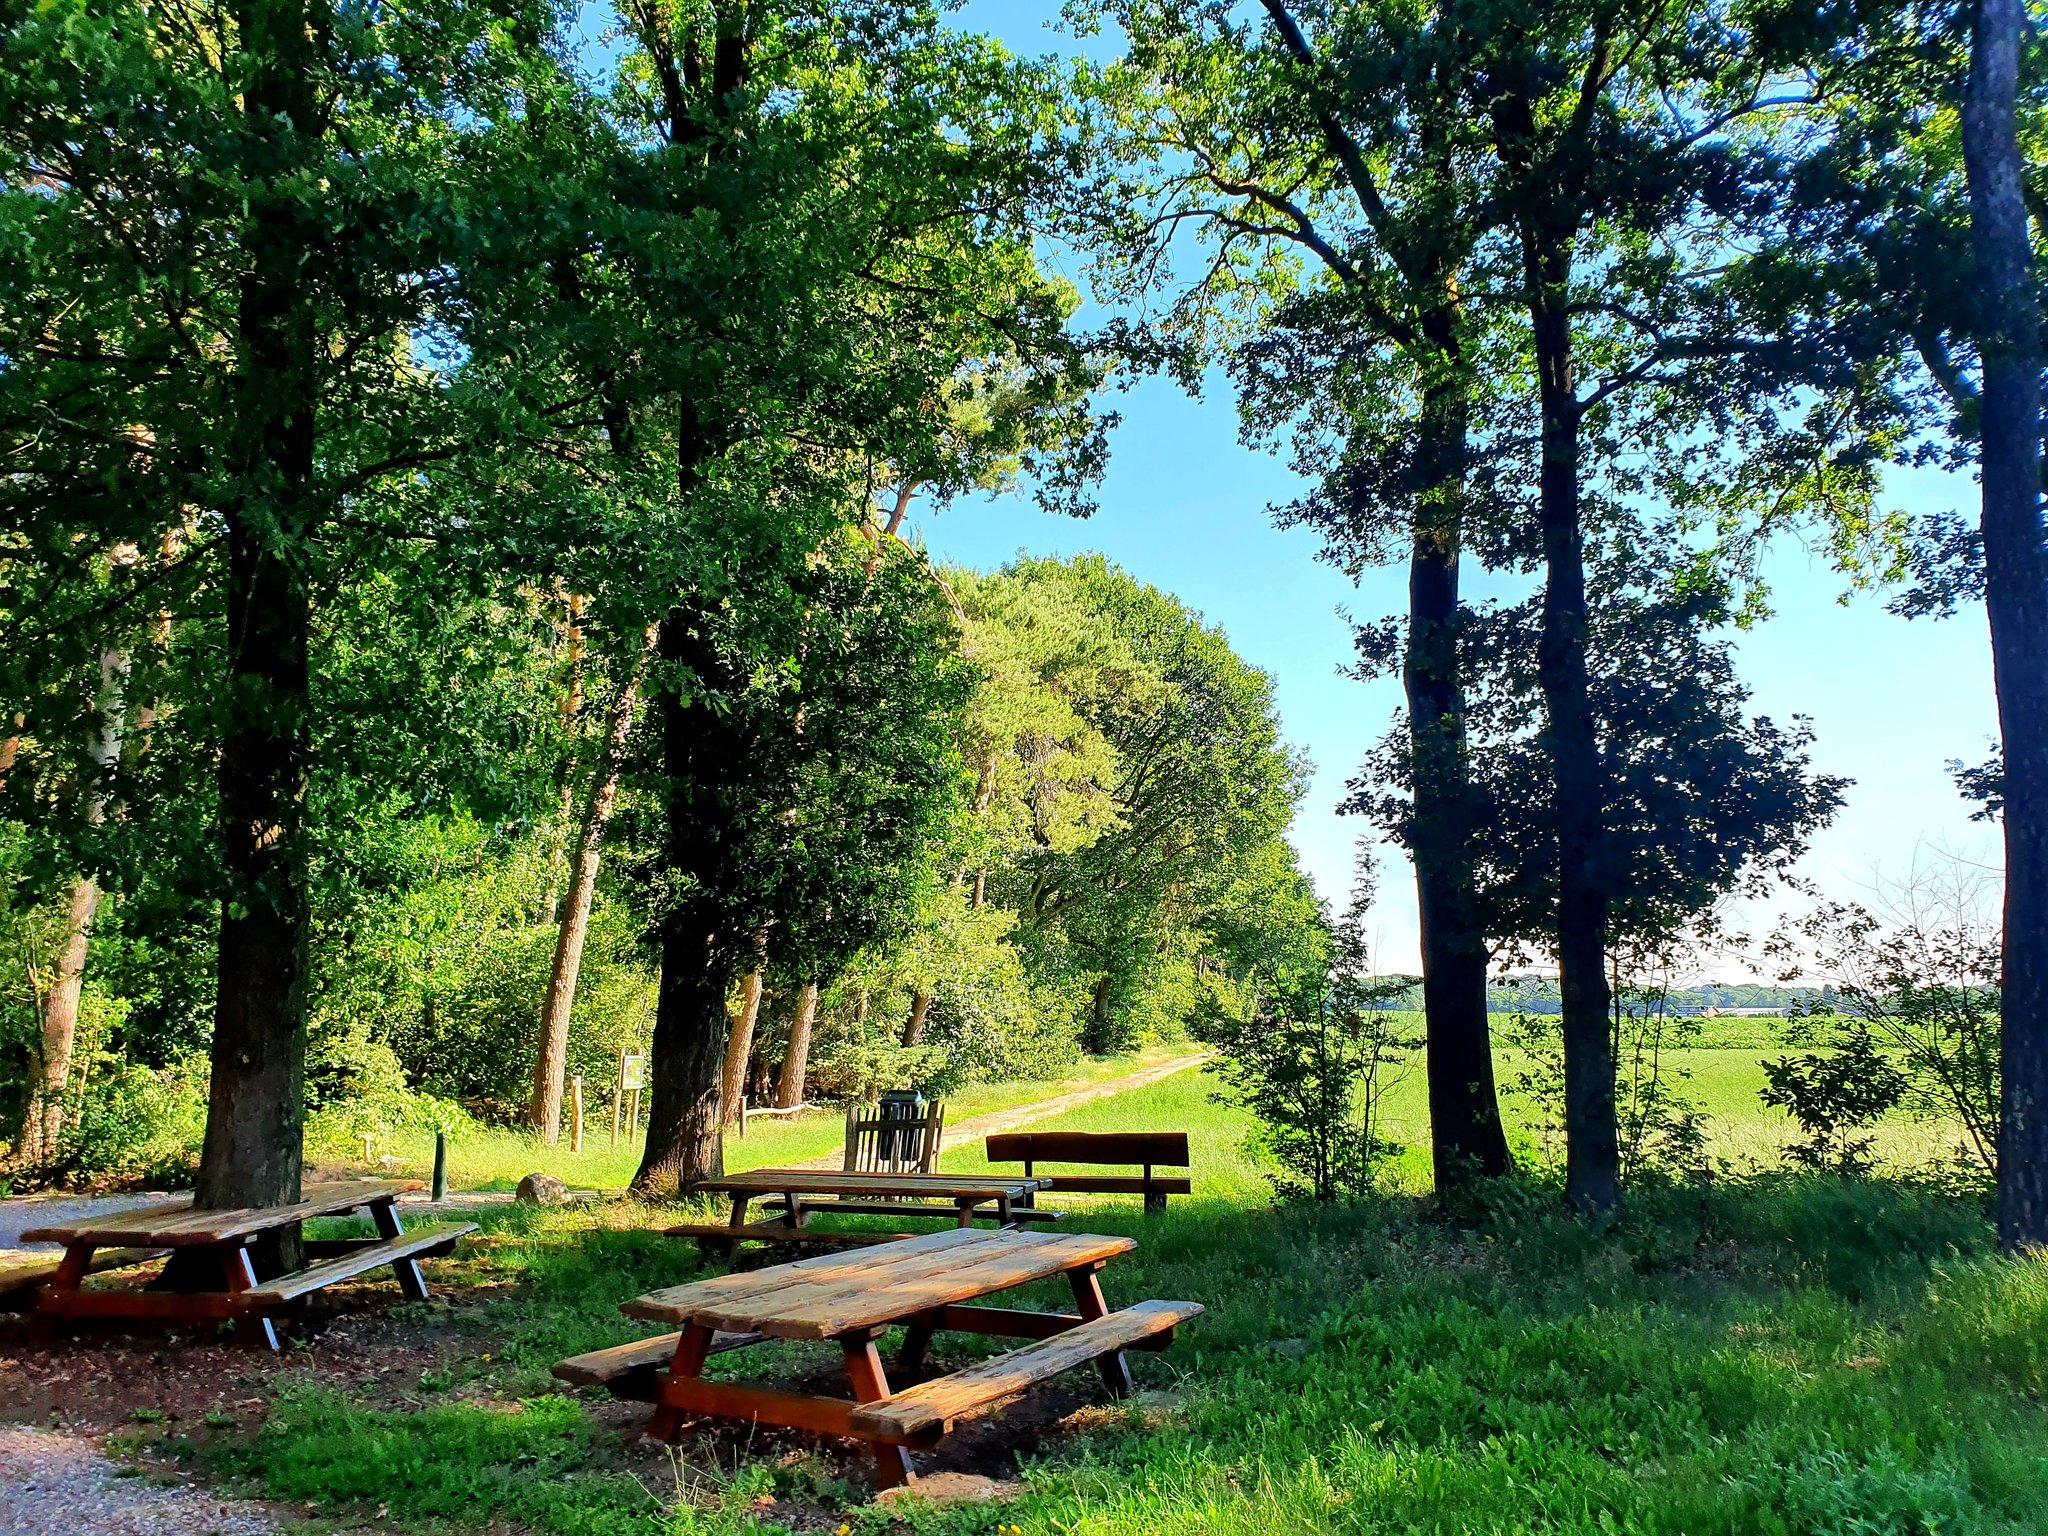 rt-wolfswandelplan-natuurbegraafplaats-bergerbos-sint-odilienberg-wandelbankjes-https-t-co-wzzcvjrirx